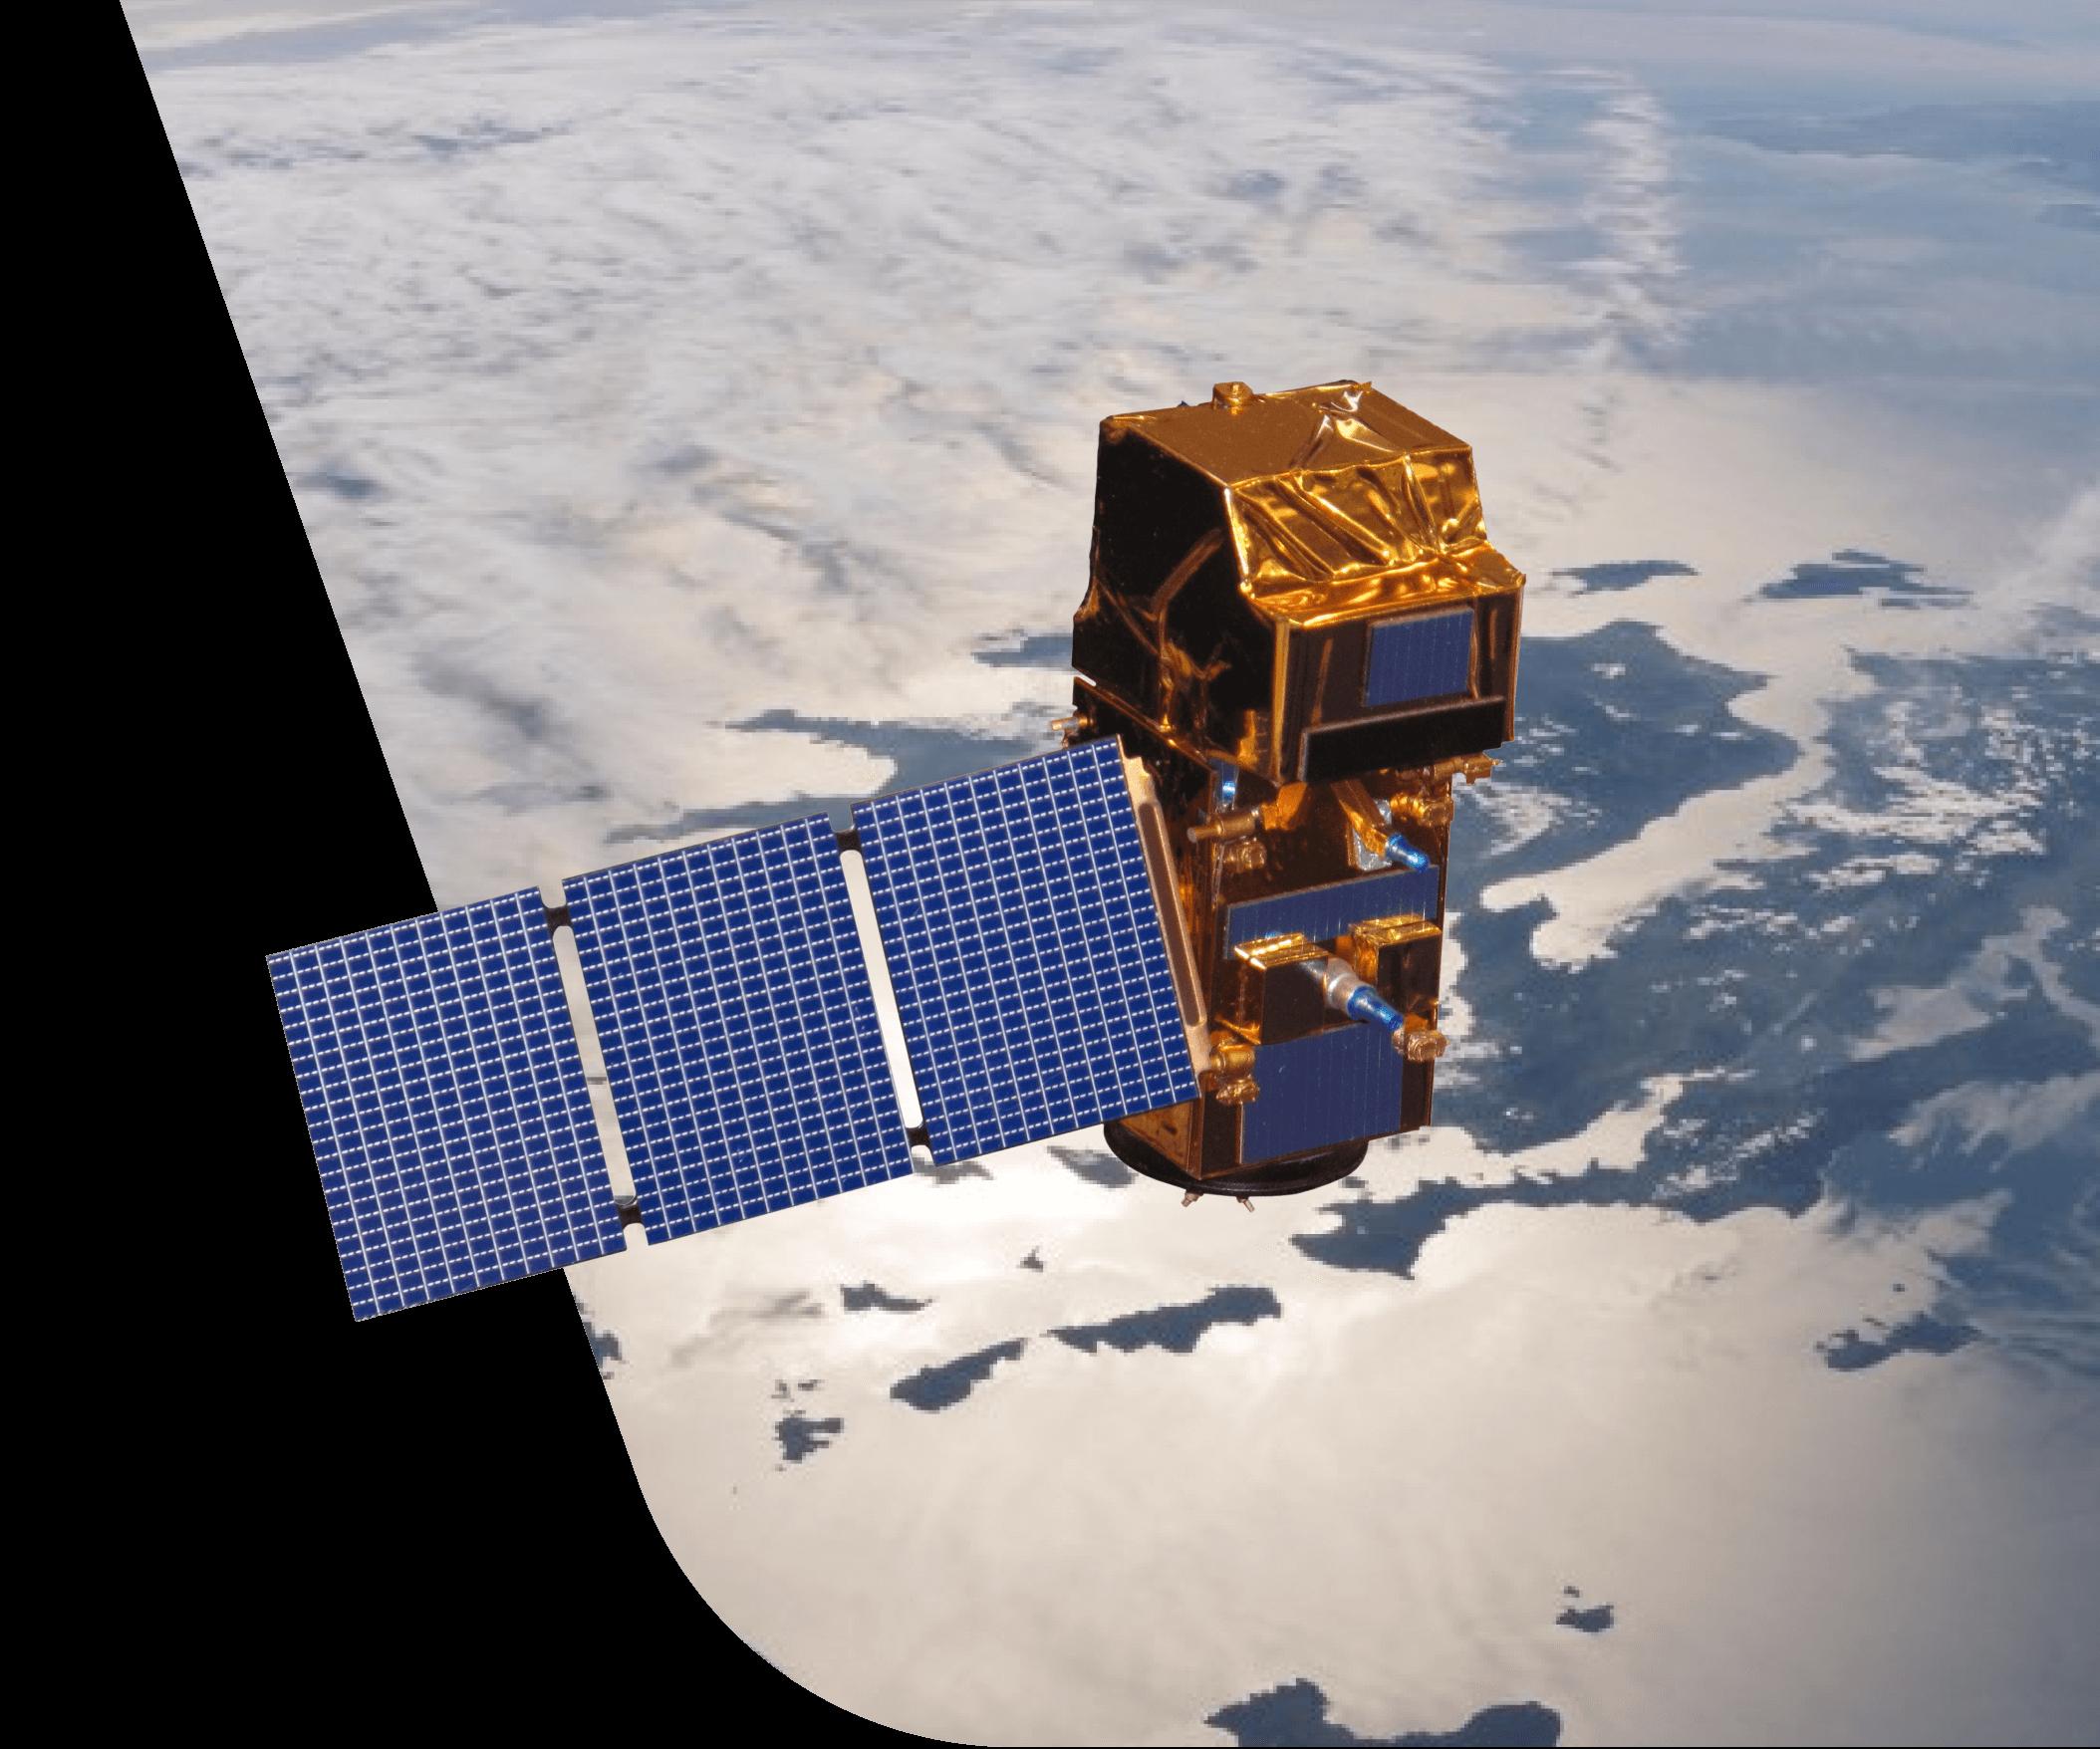 ecosistema de satélite para un análisis de datos eficaz